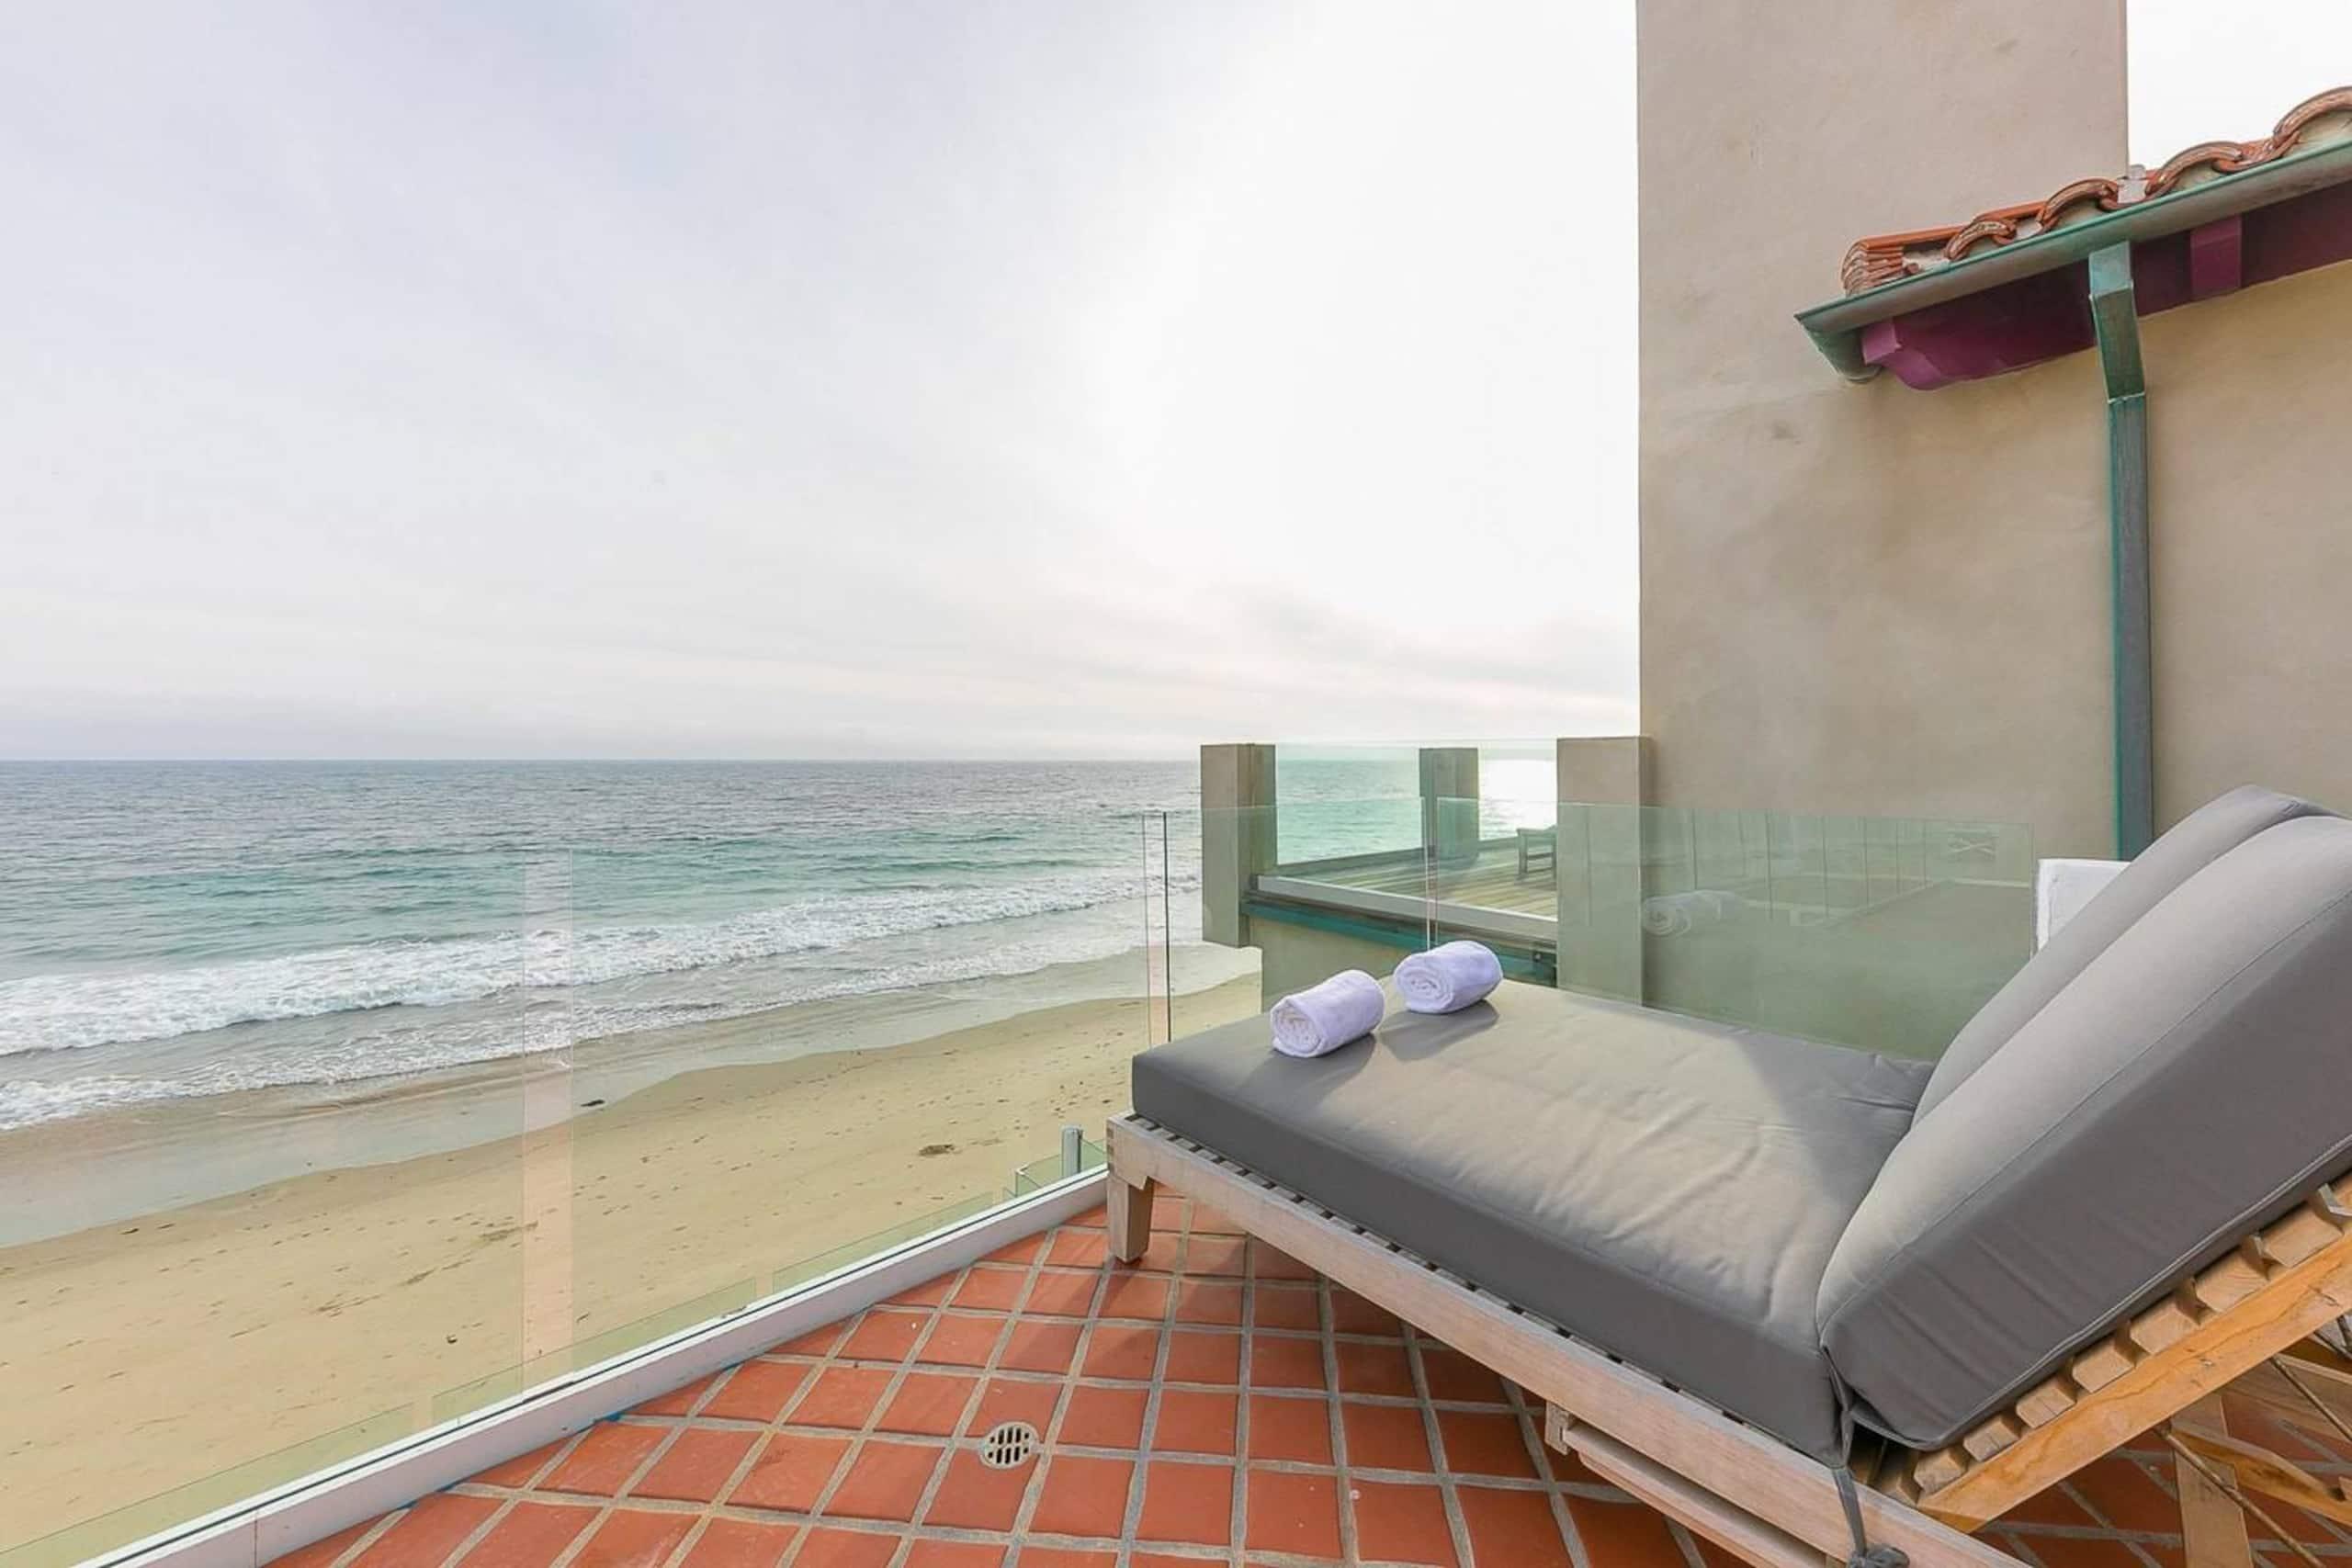 Apartment Villa Shawaiz - Beachfront Villa with 5 beds  photo 20334295